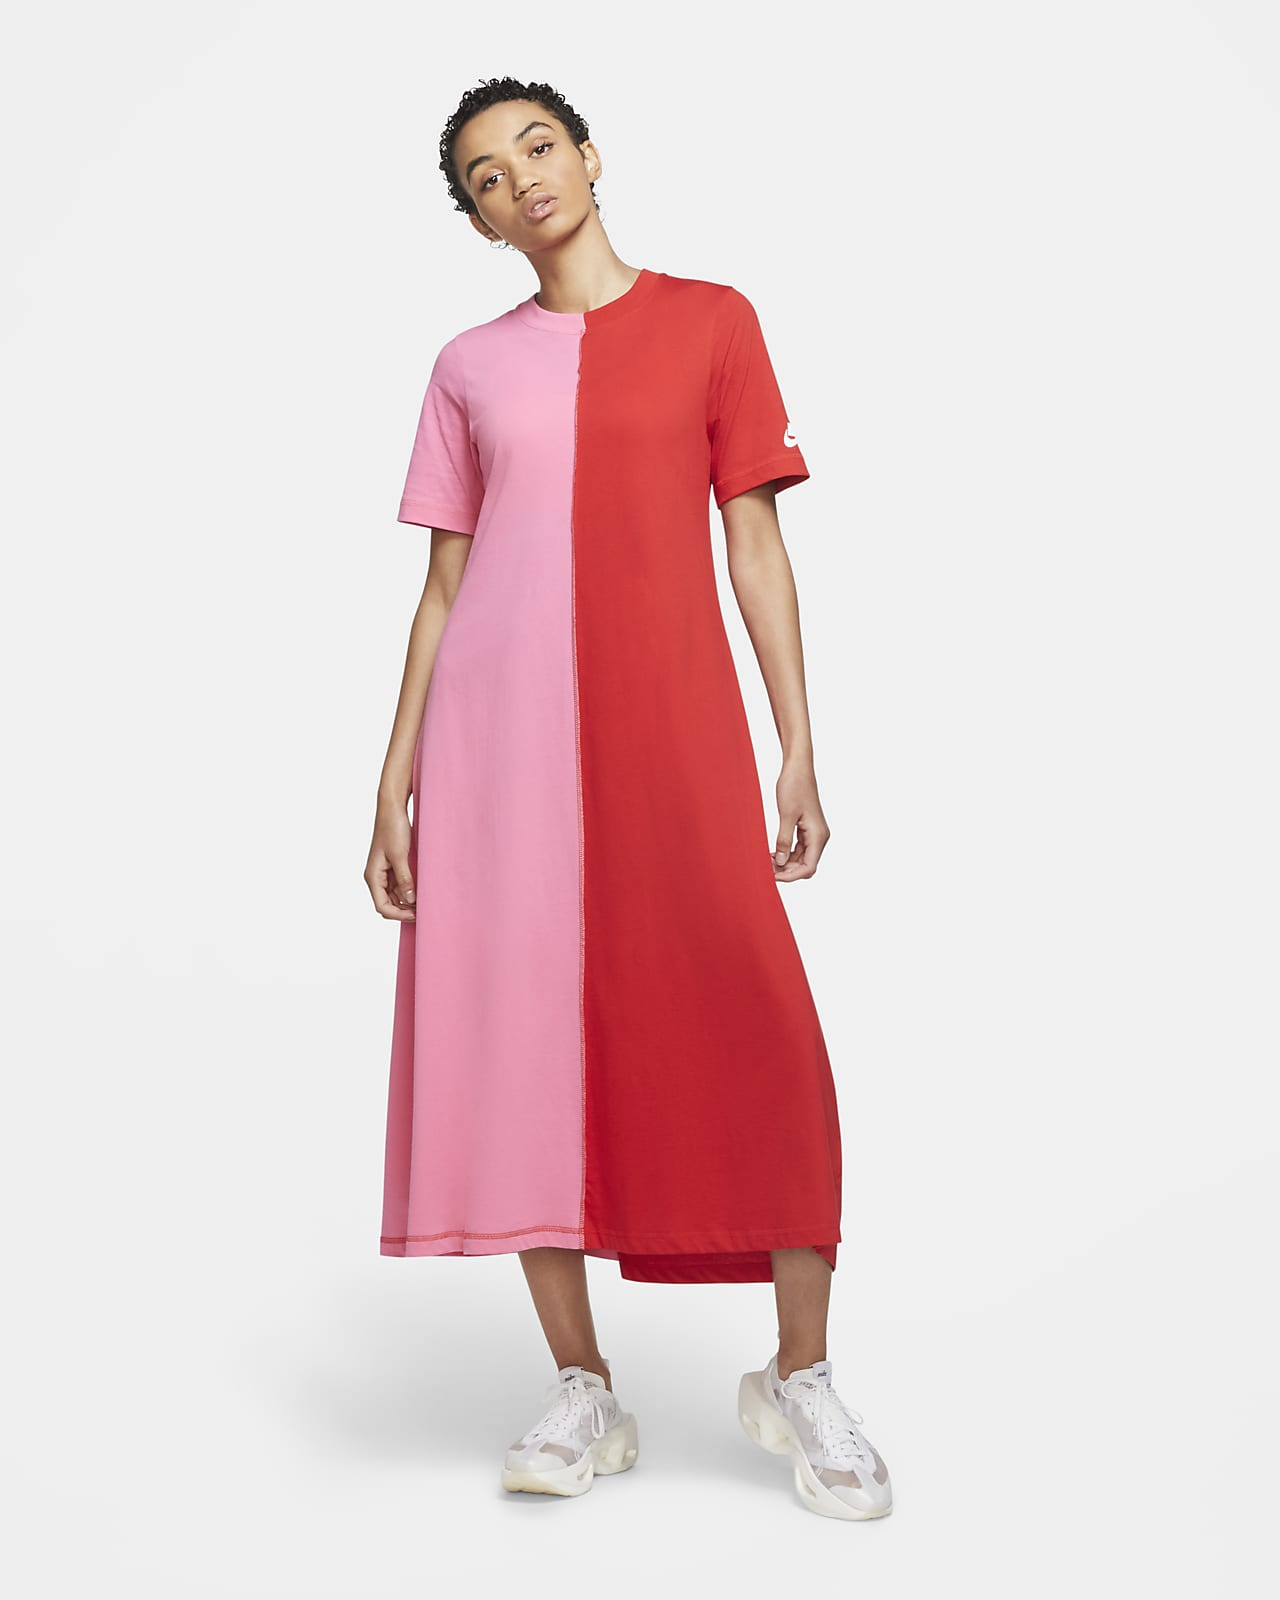 Nike Sportswear NSW rövid ujjú női ruha